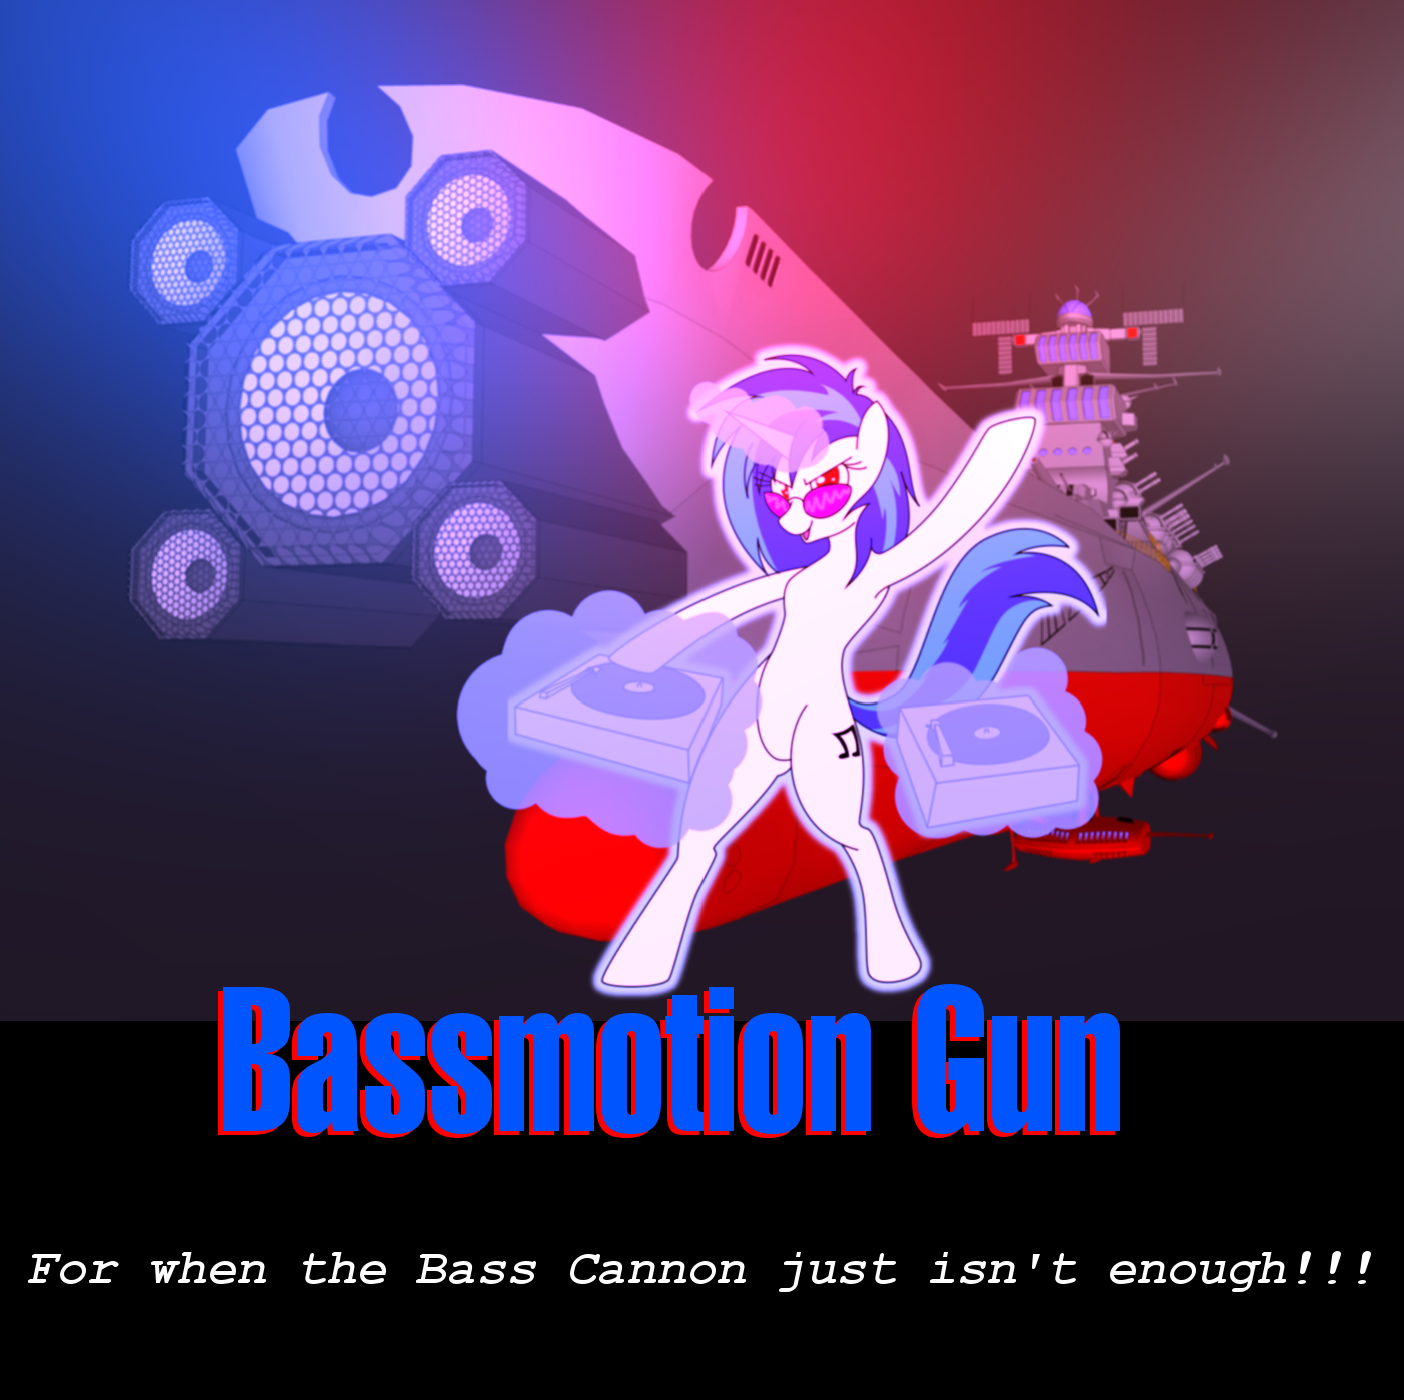 Bassmotion Gun by NezumiYuki